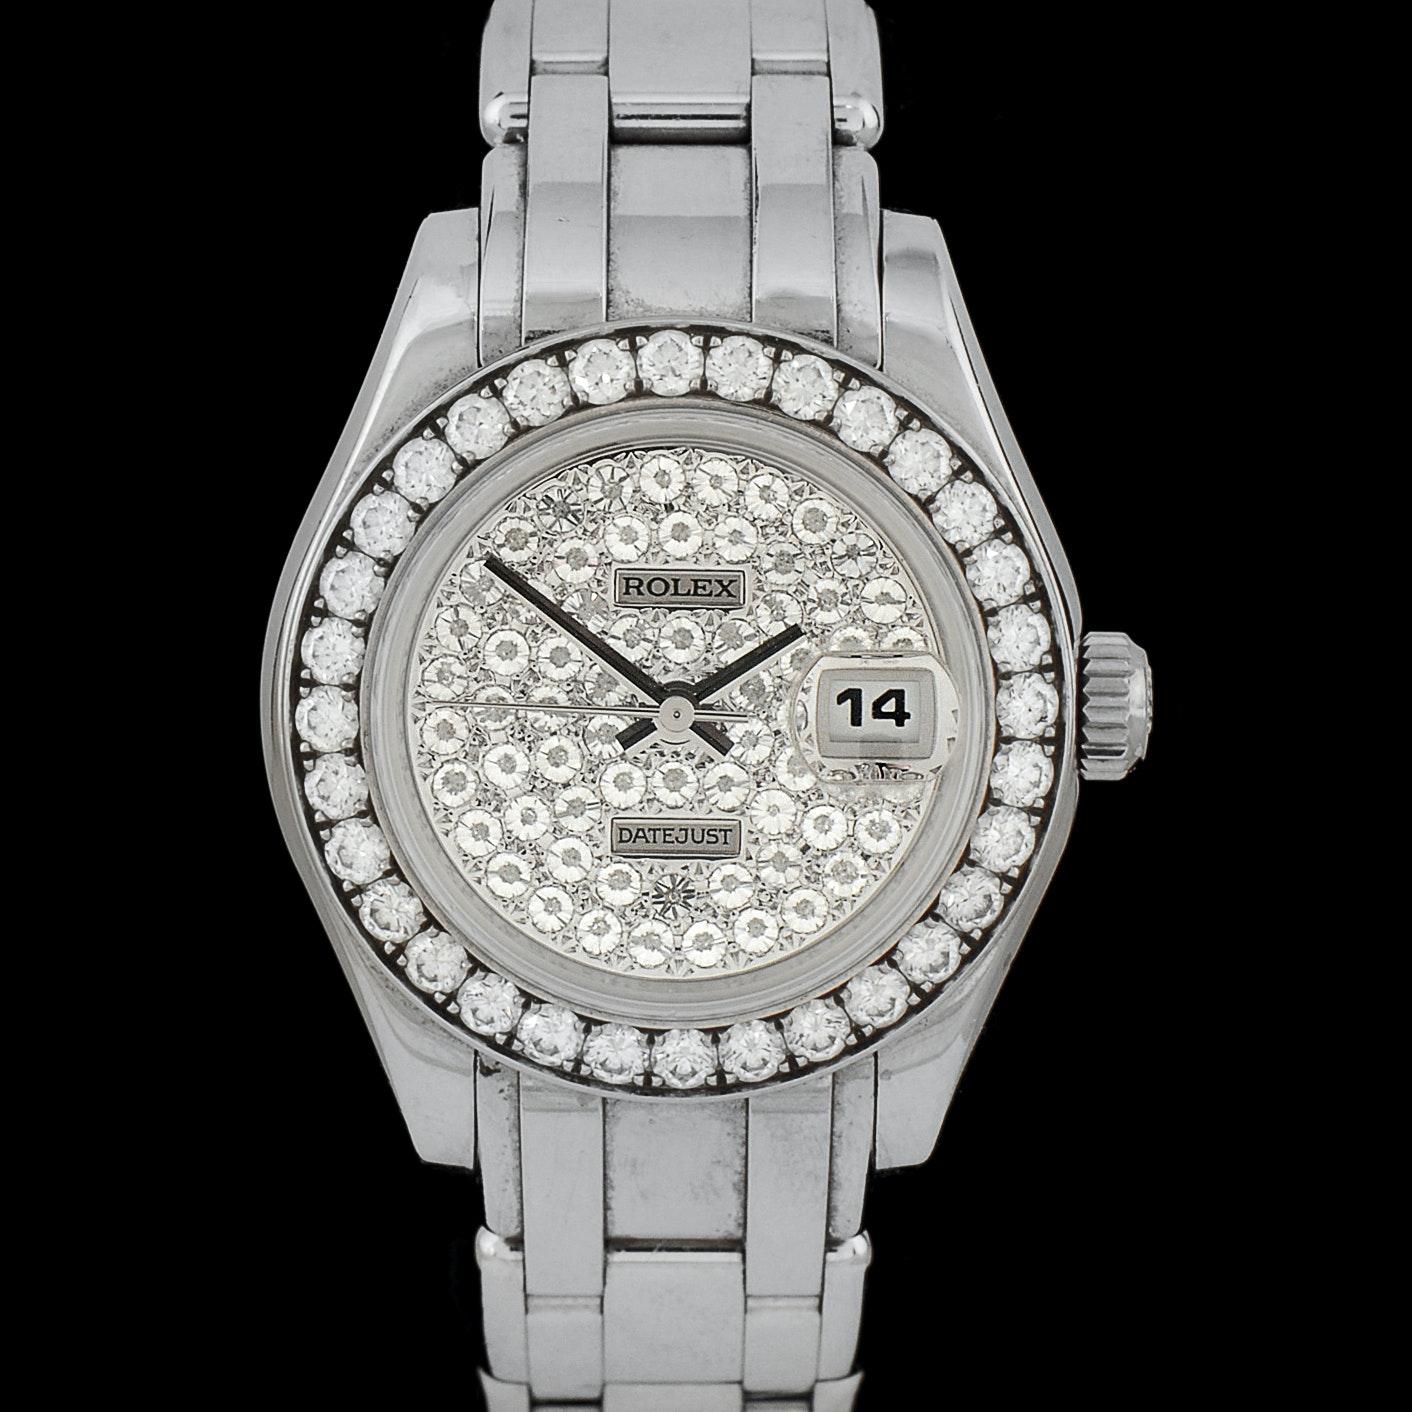 Women's 18K White Gold and Diamond Rolex Datejust Wristwatch